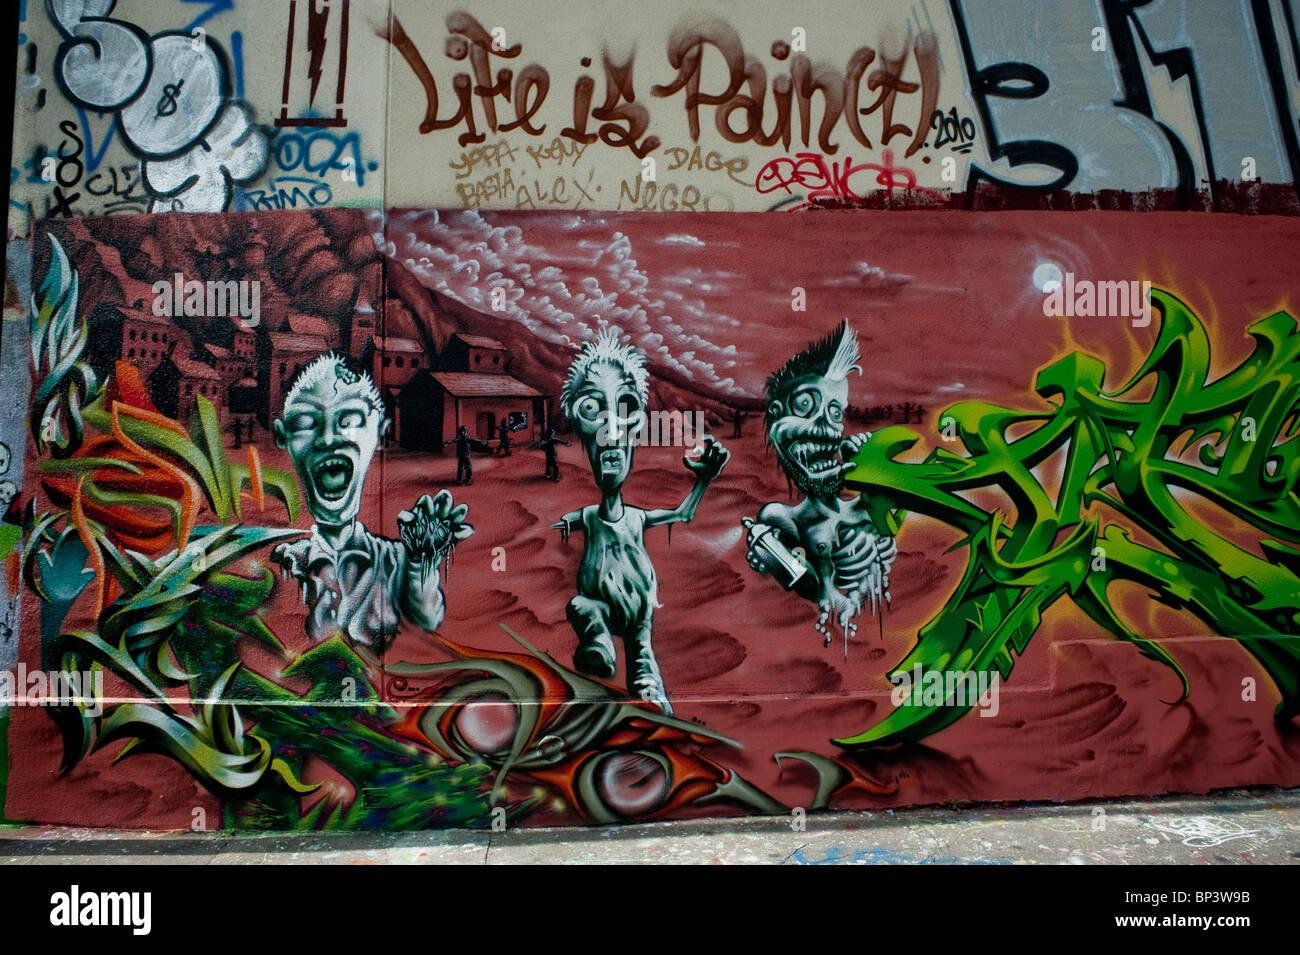 Paris France Painting Wall with Spray Paint Graffiti Graphic Art  Street Art  & Paris France Painting Wall with Spray Paint Graffiti Graphic Art ...